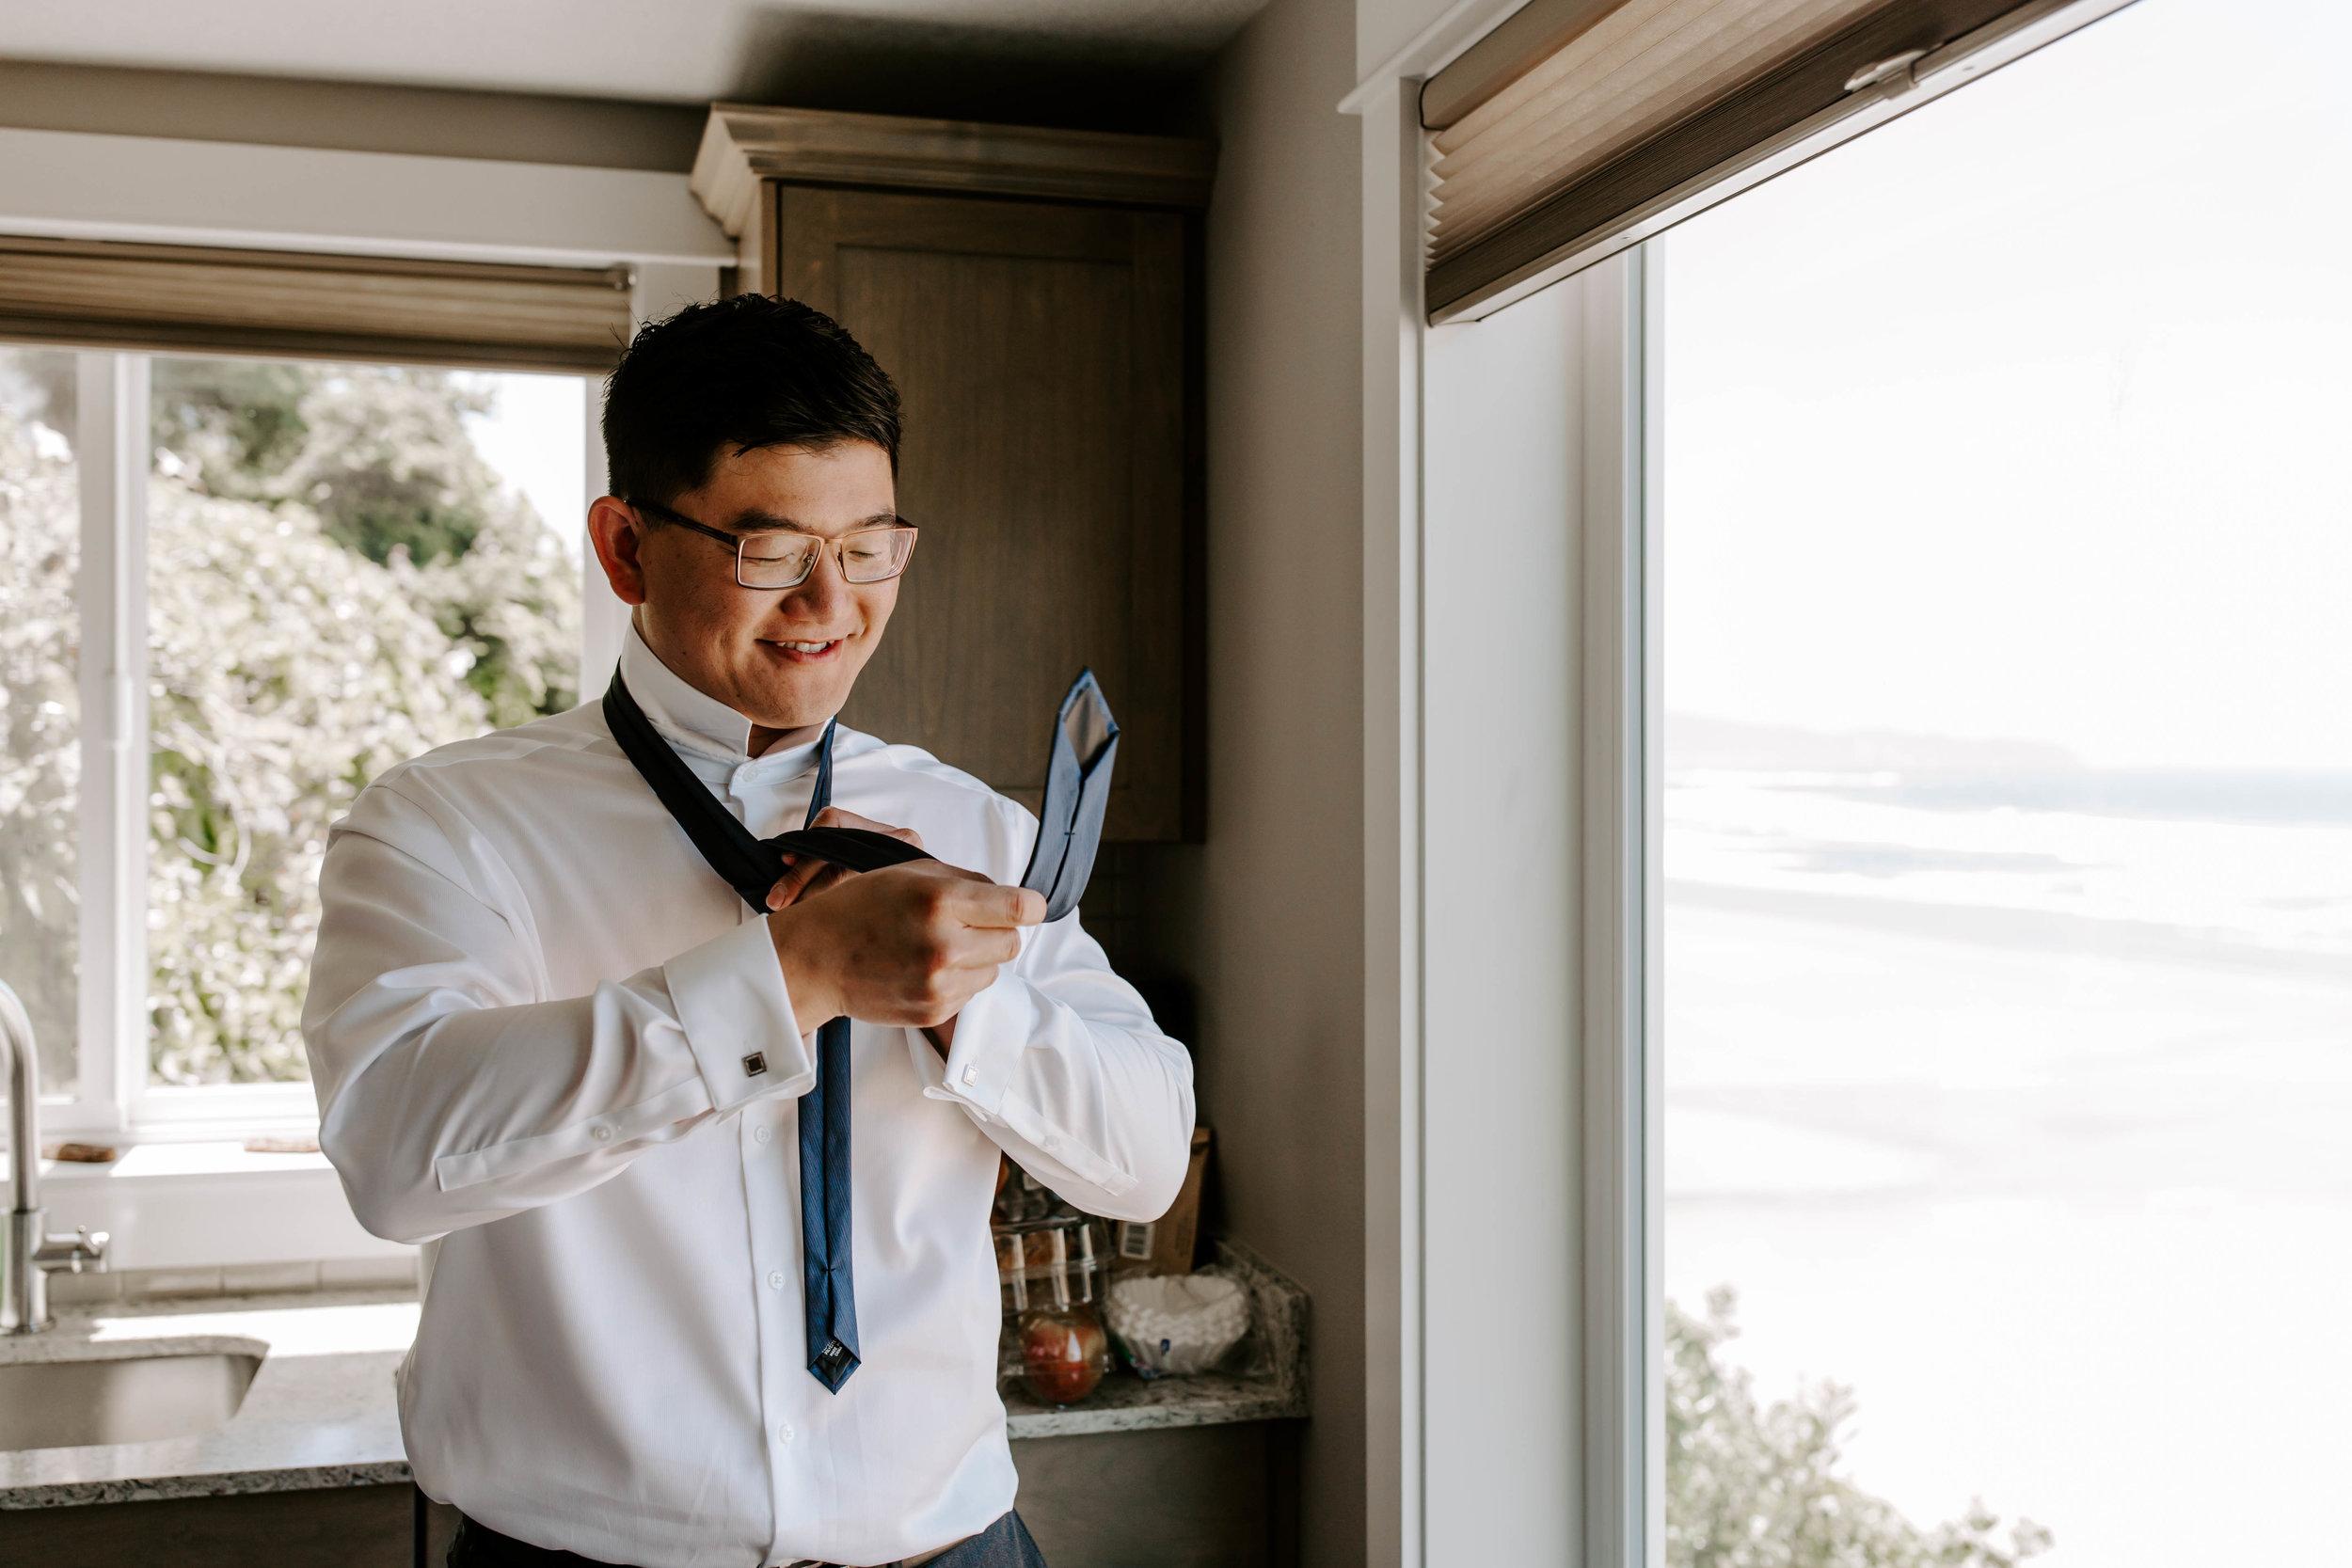 Oregon Coast Wedding Photographer | Documentary Style | Rustic Bloom Photography